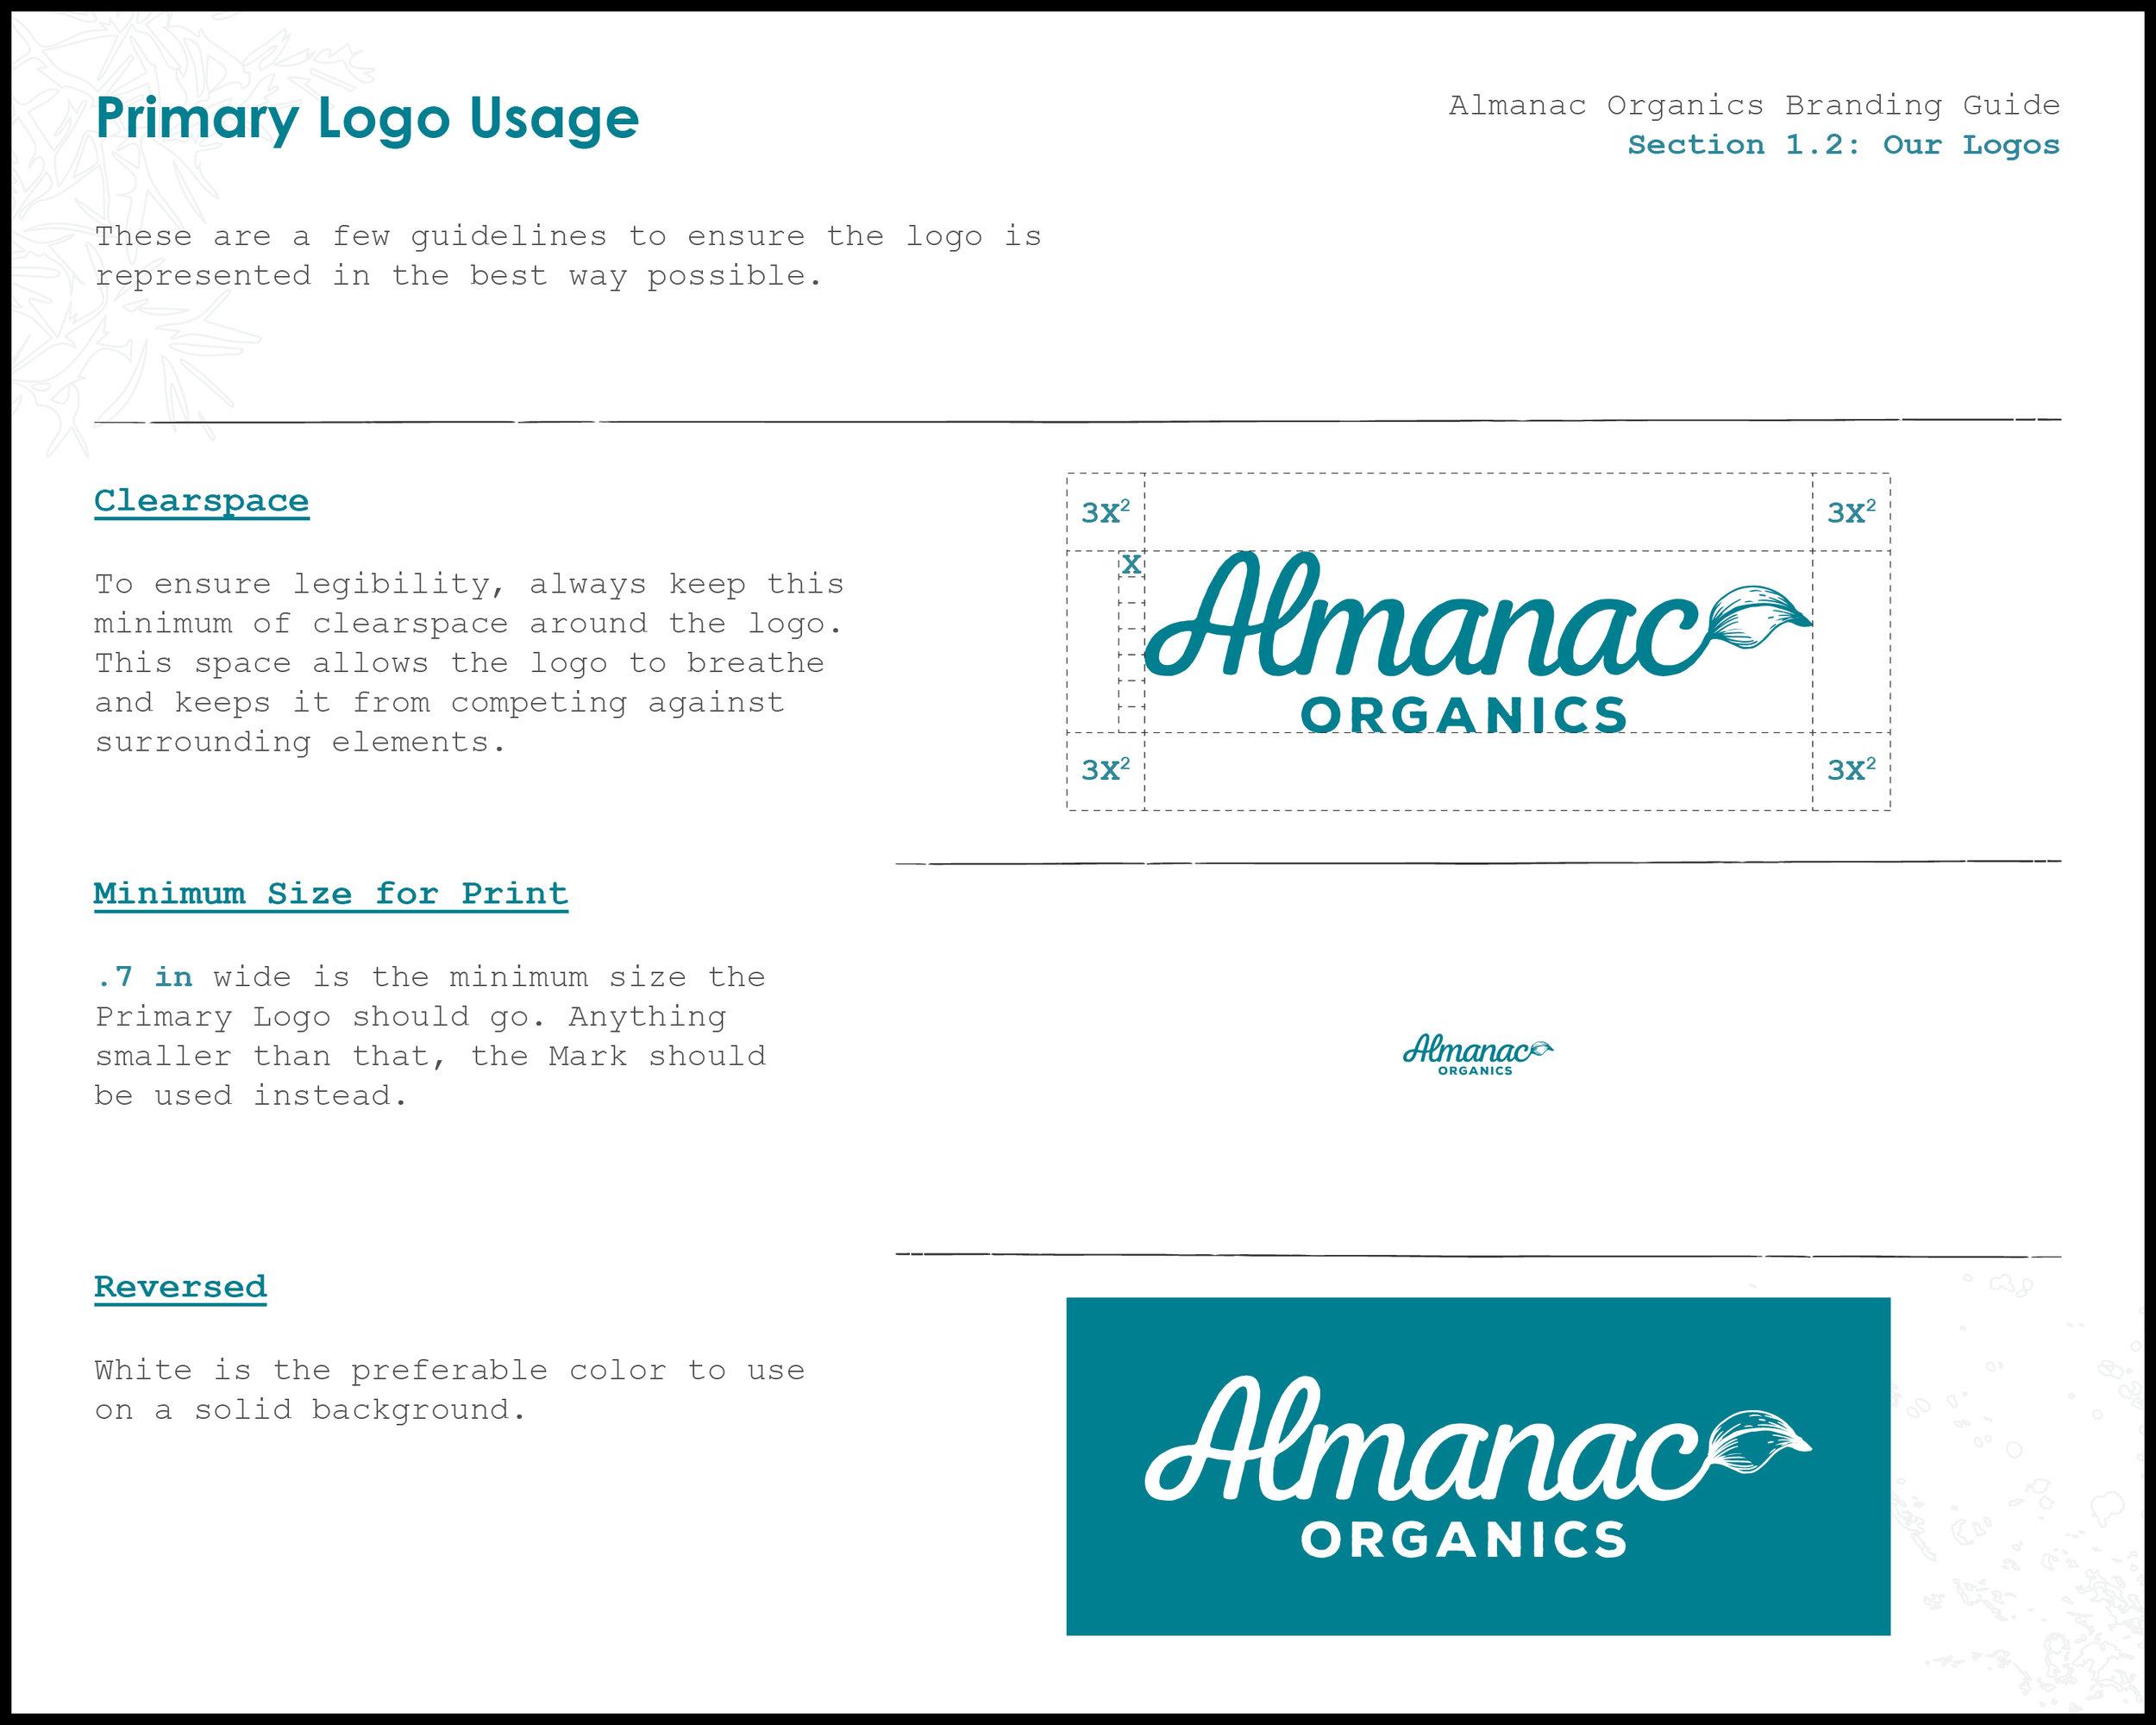 Almanac_Organics_Branding_Guide7.jpg